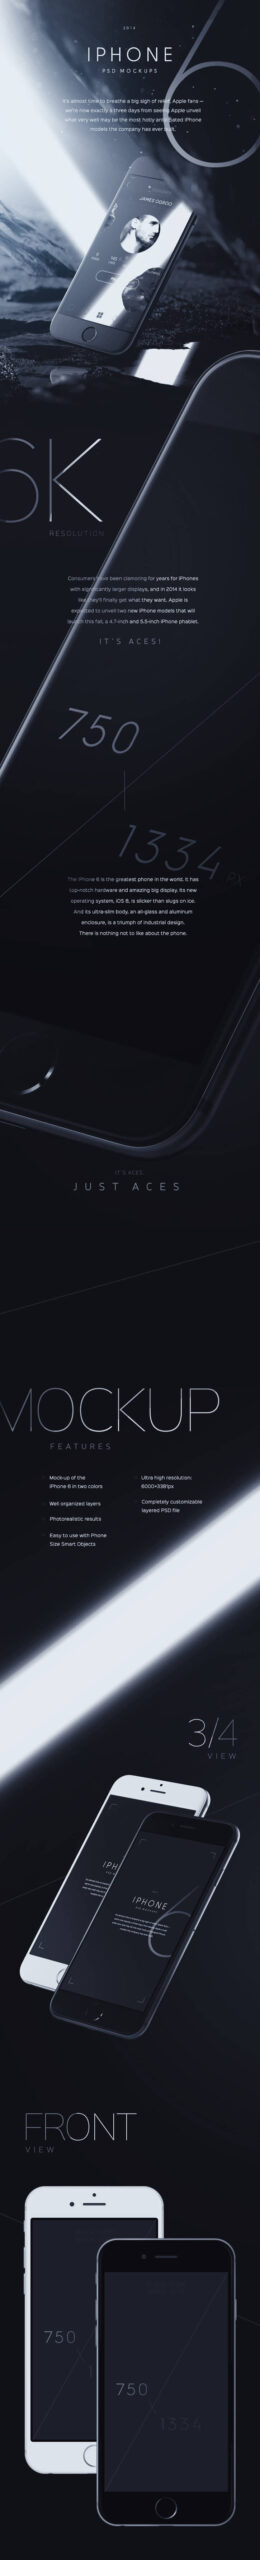 Free Amazing iPhone 6 Mockups PSD Templates2